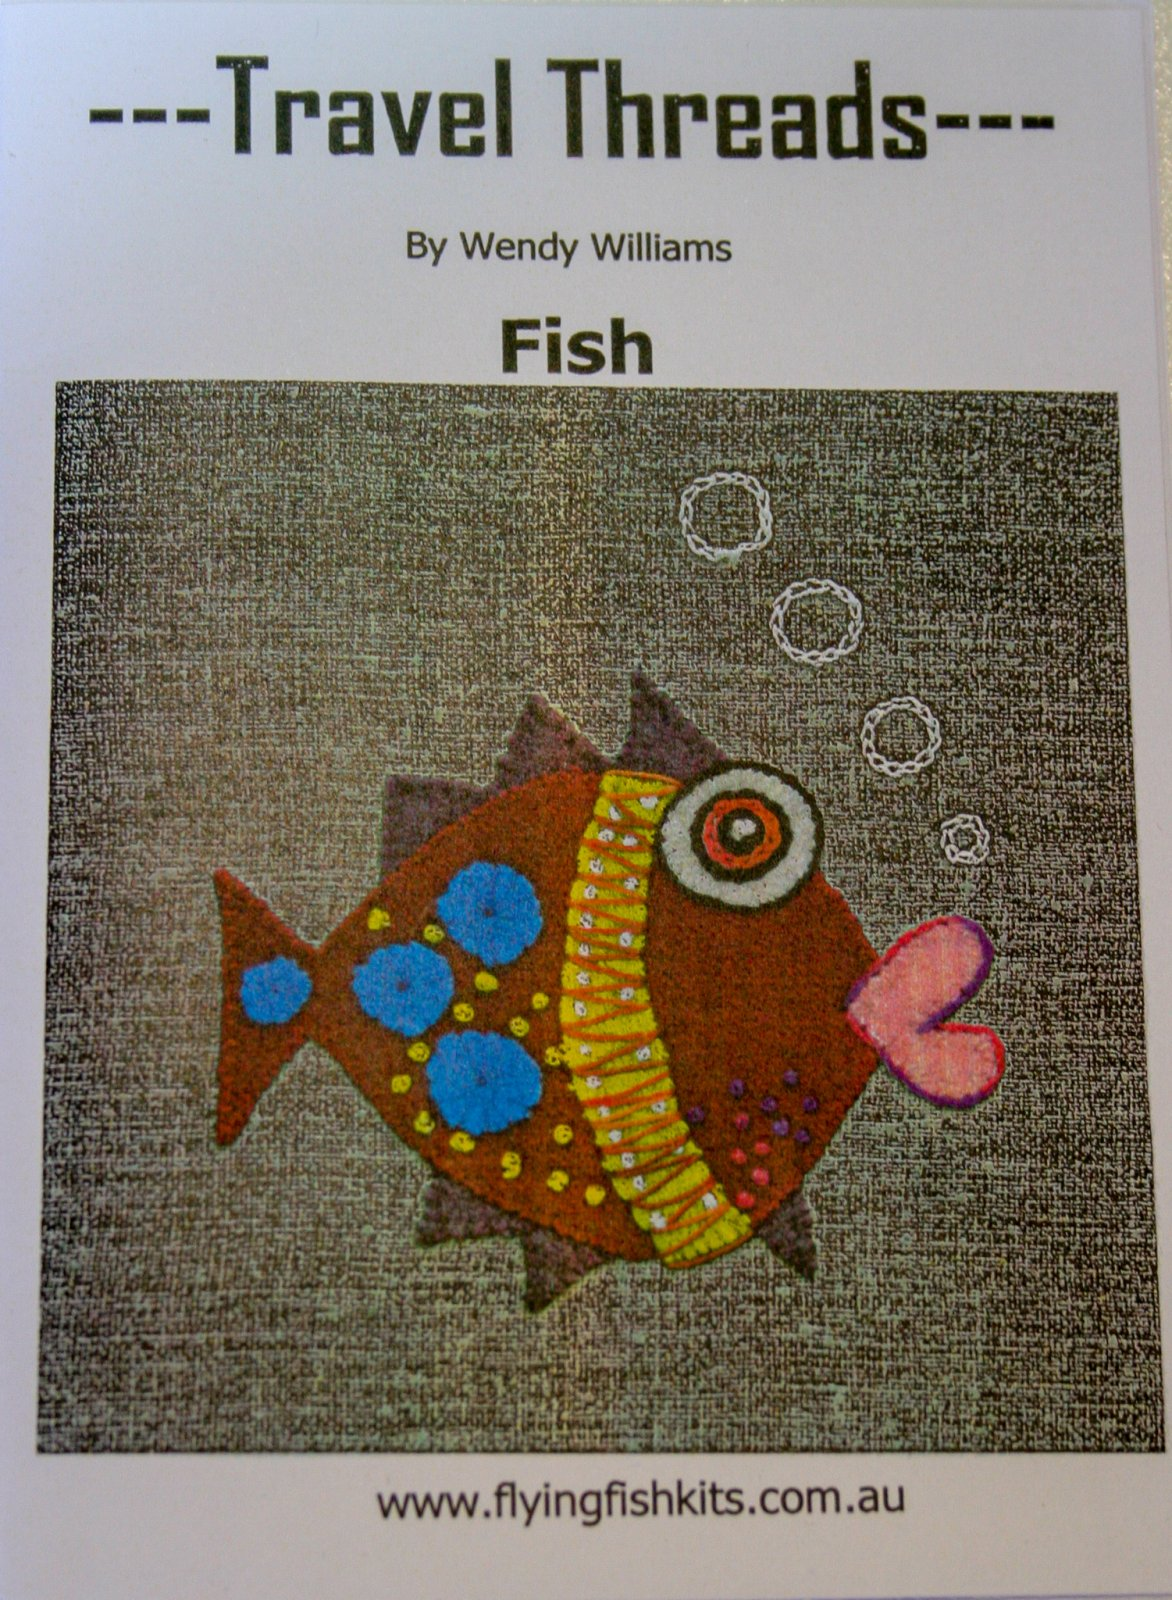 Wendy Williams : Travel Threads - Fish